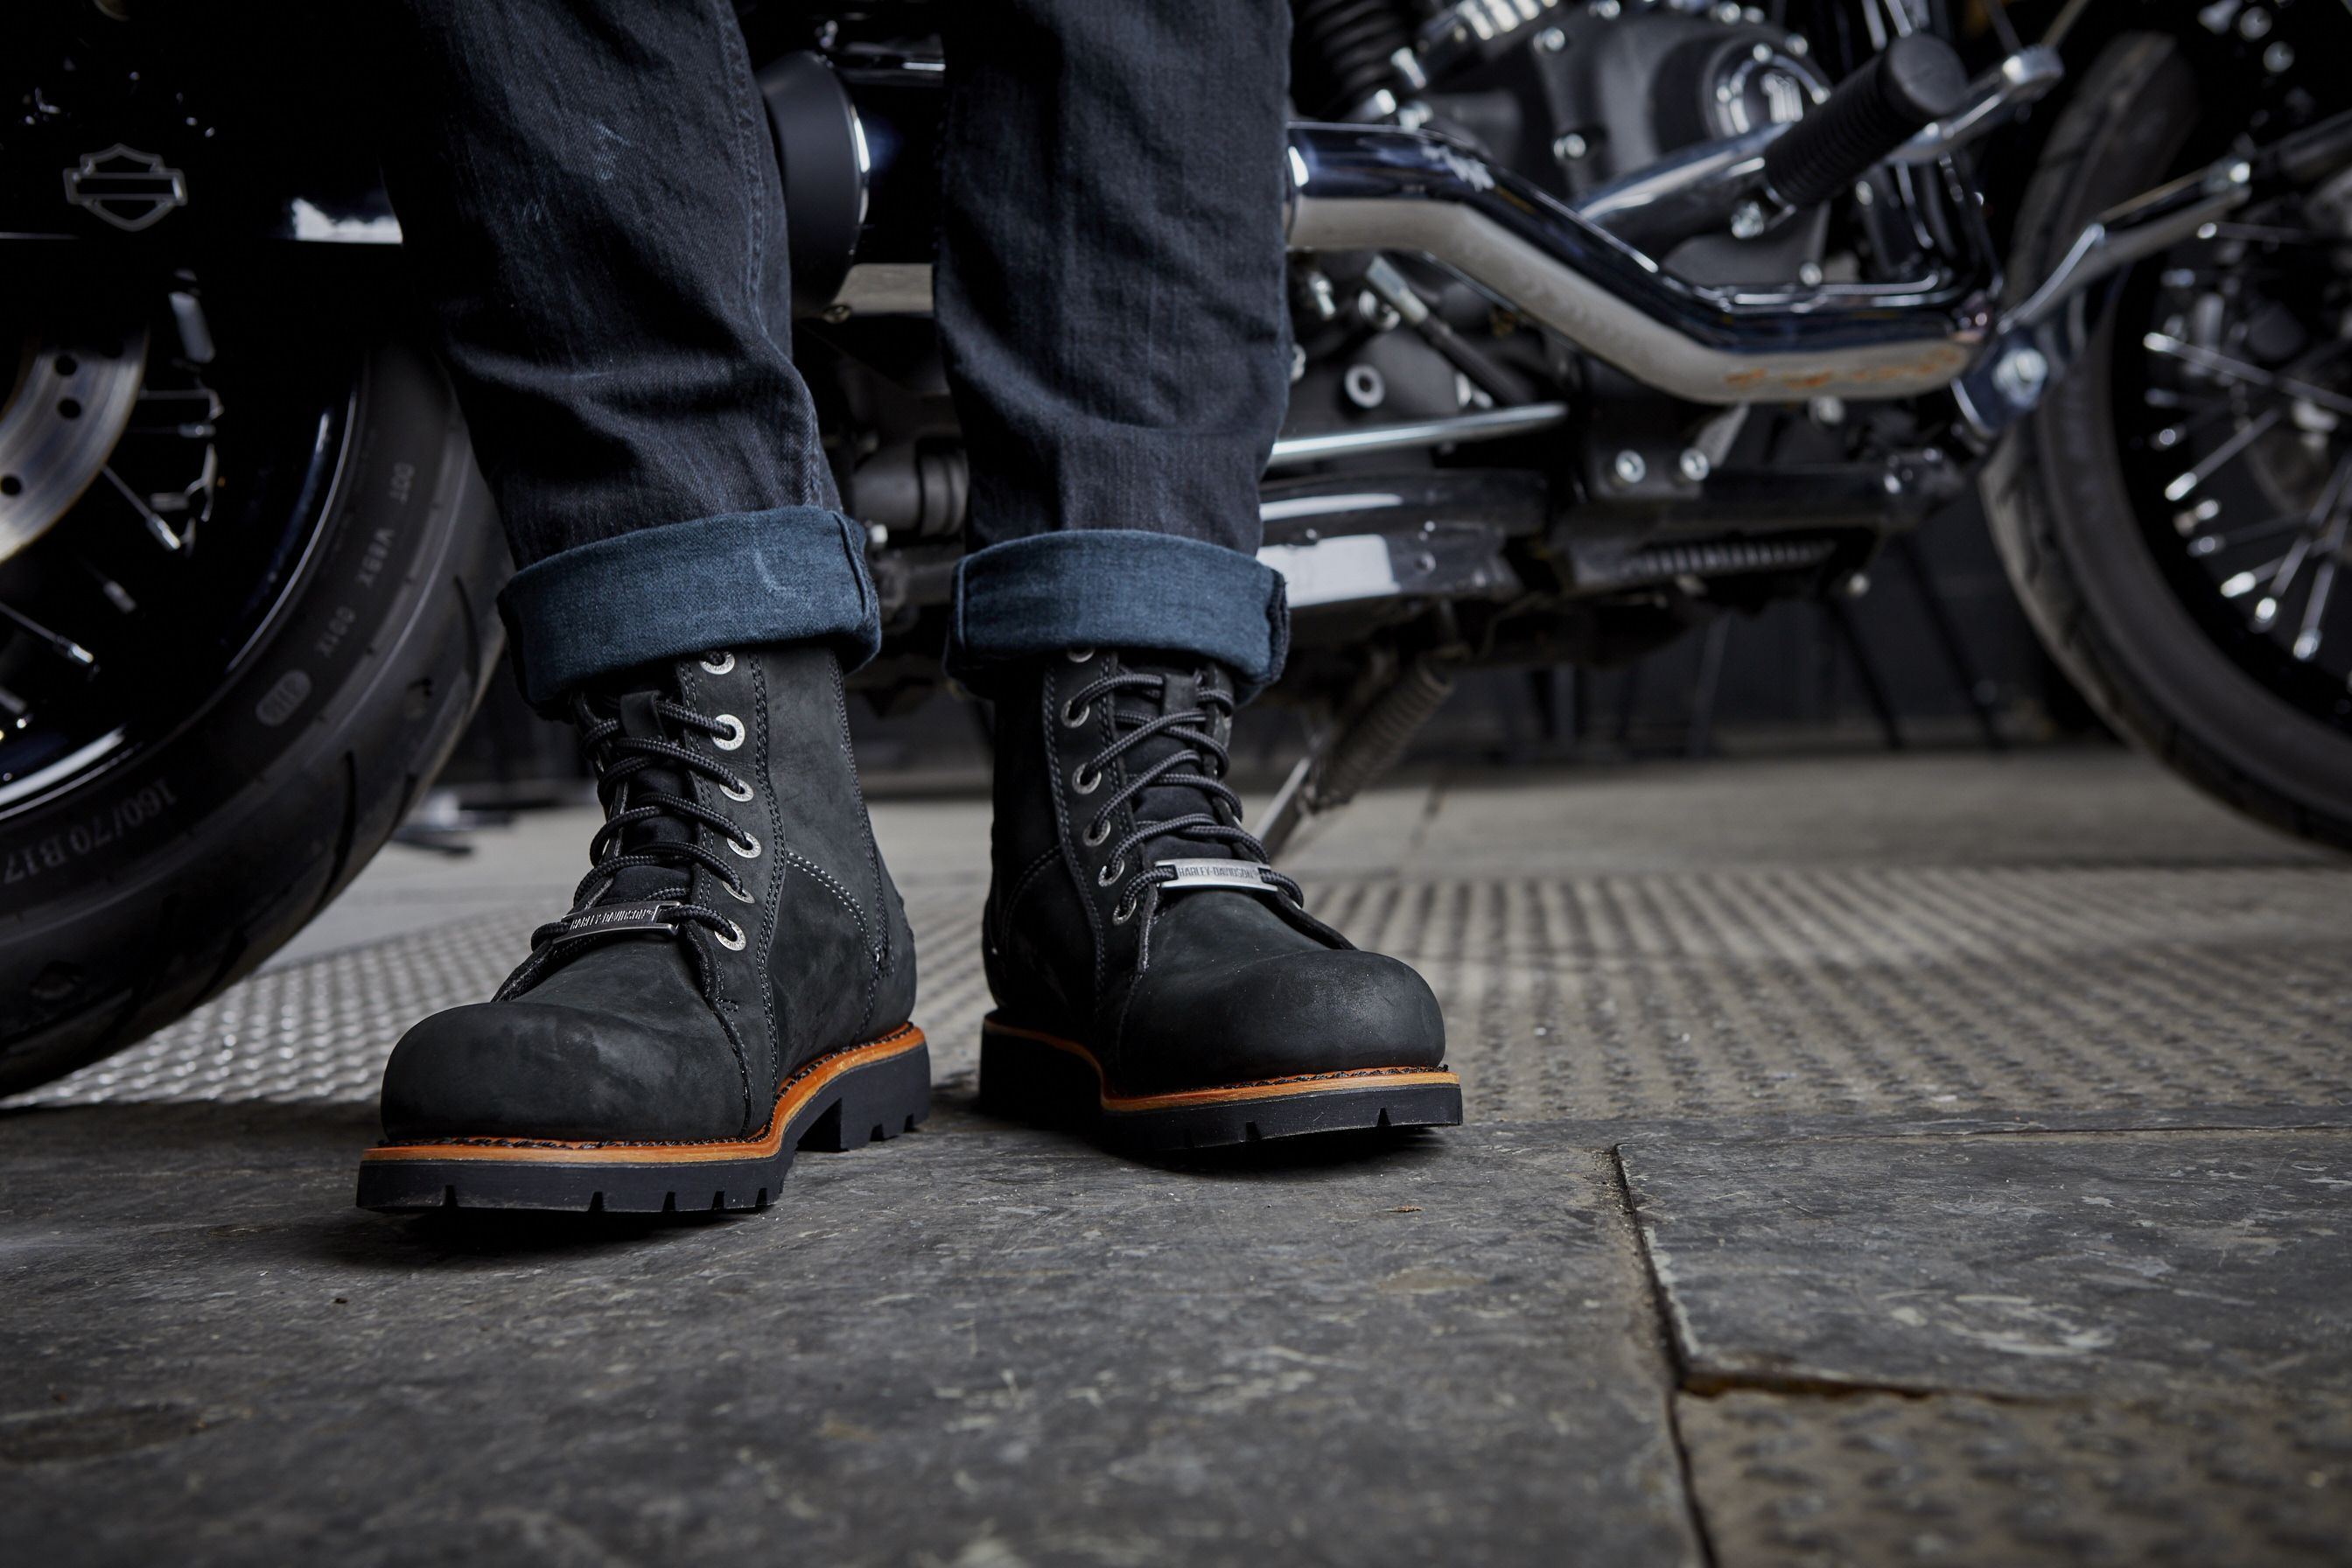 83984986353 Men s Wickson Boot Mens Motorcycle Boots